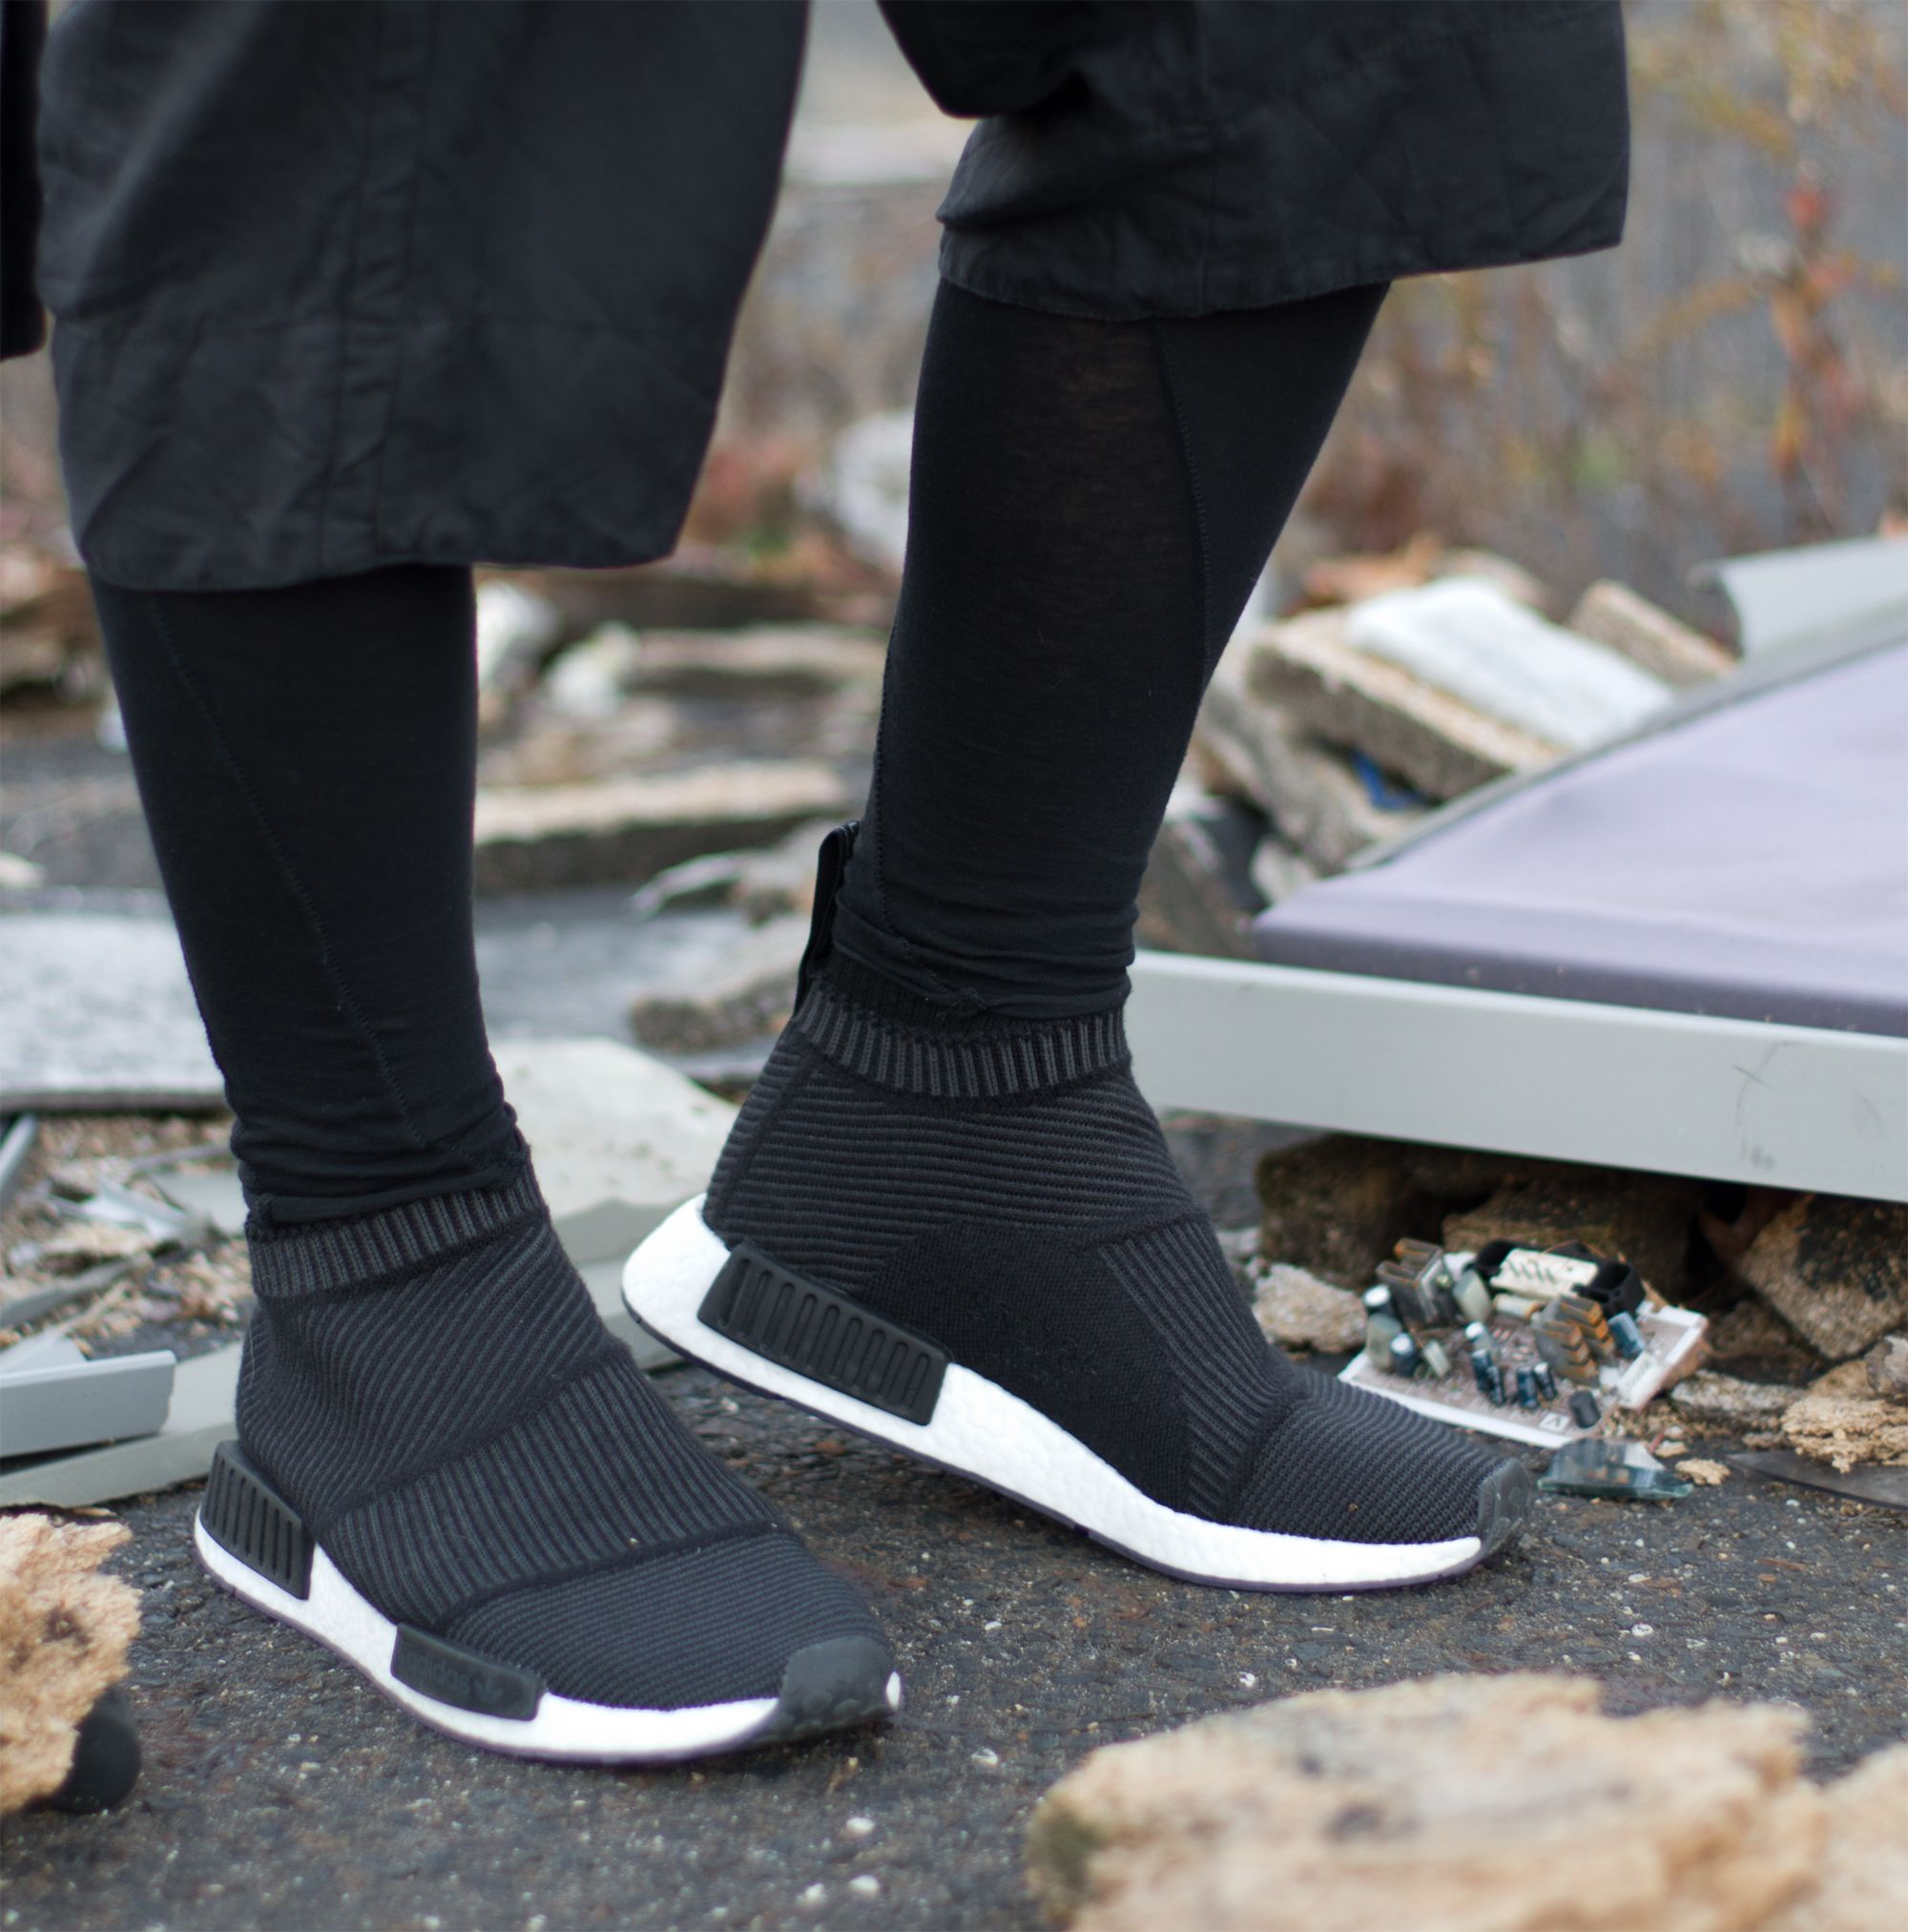 [PICKUP] Adidas NMD CS1 PK Winter Wool